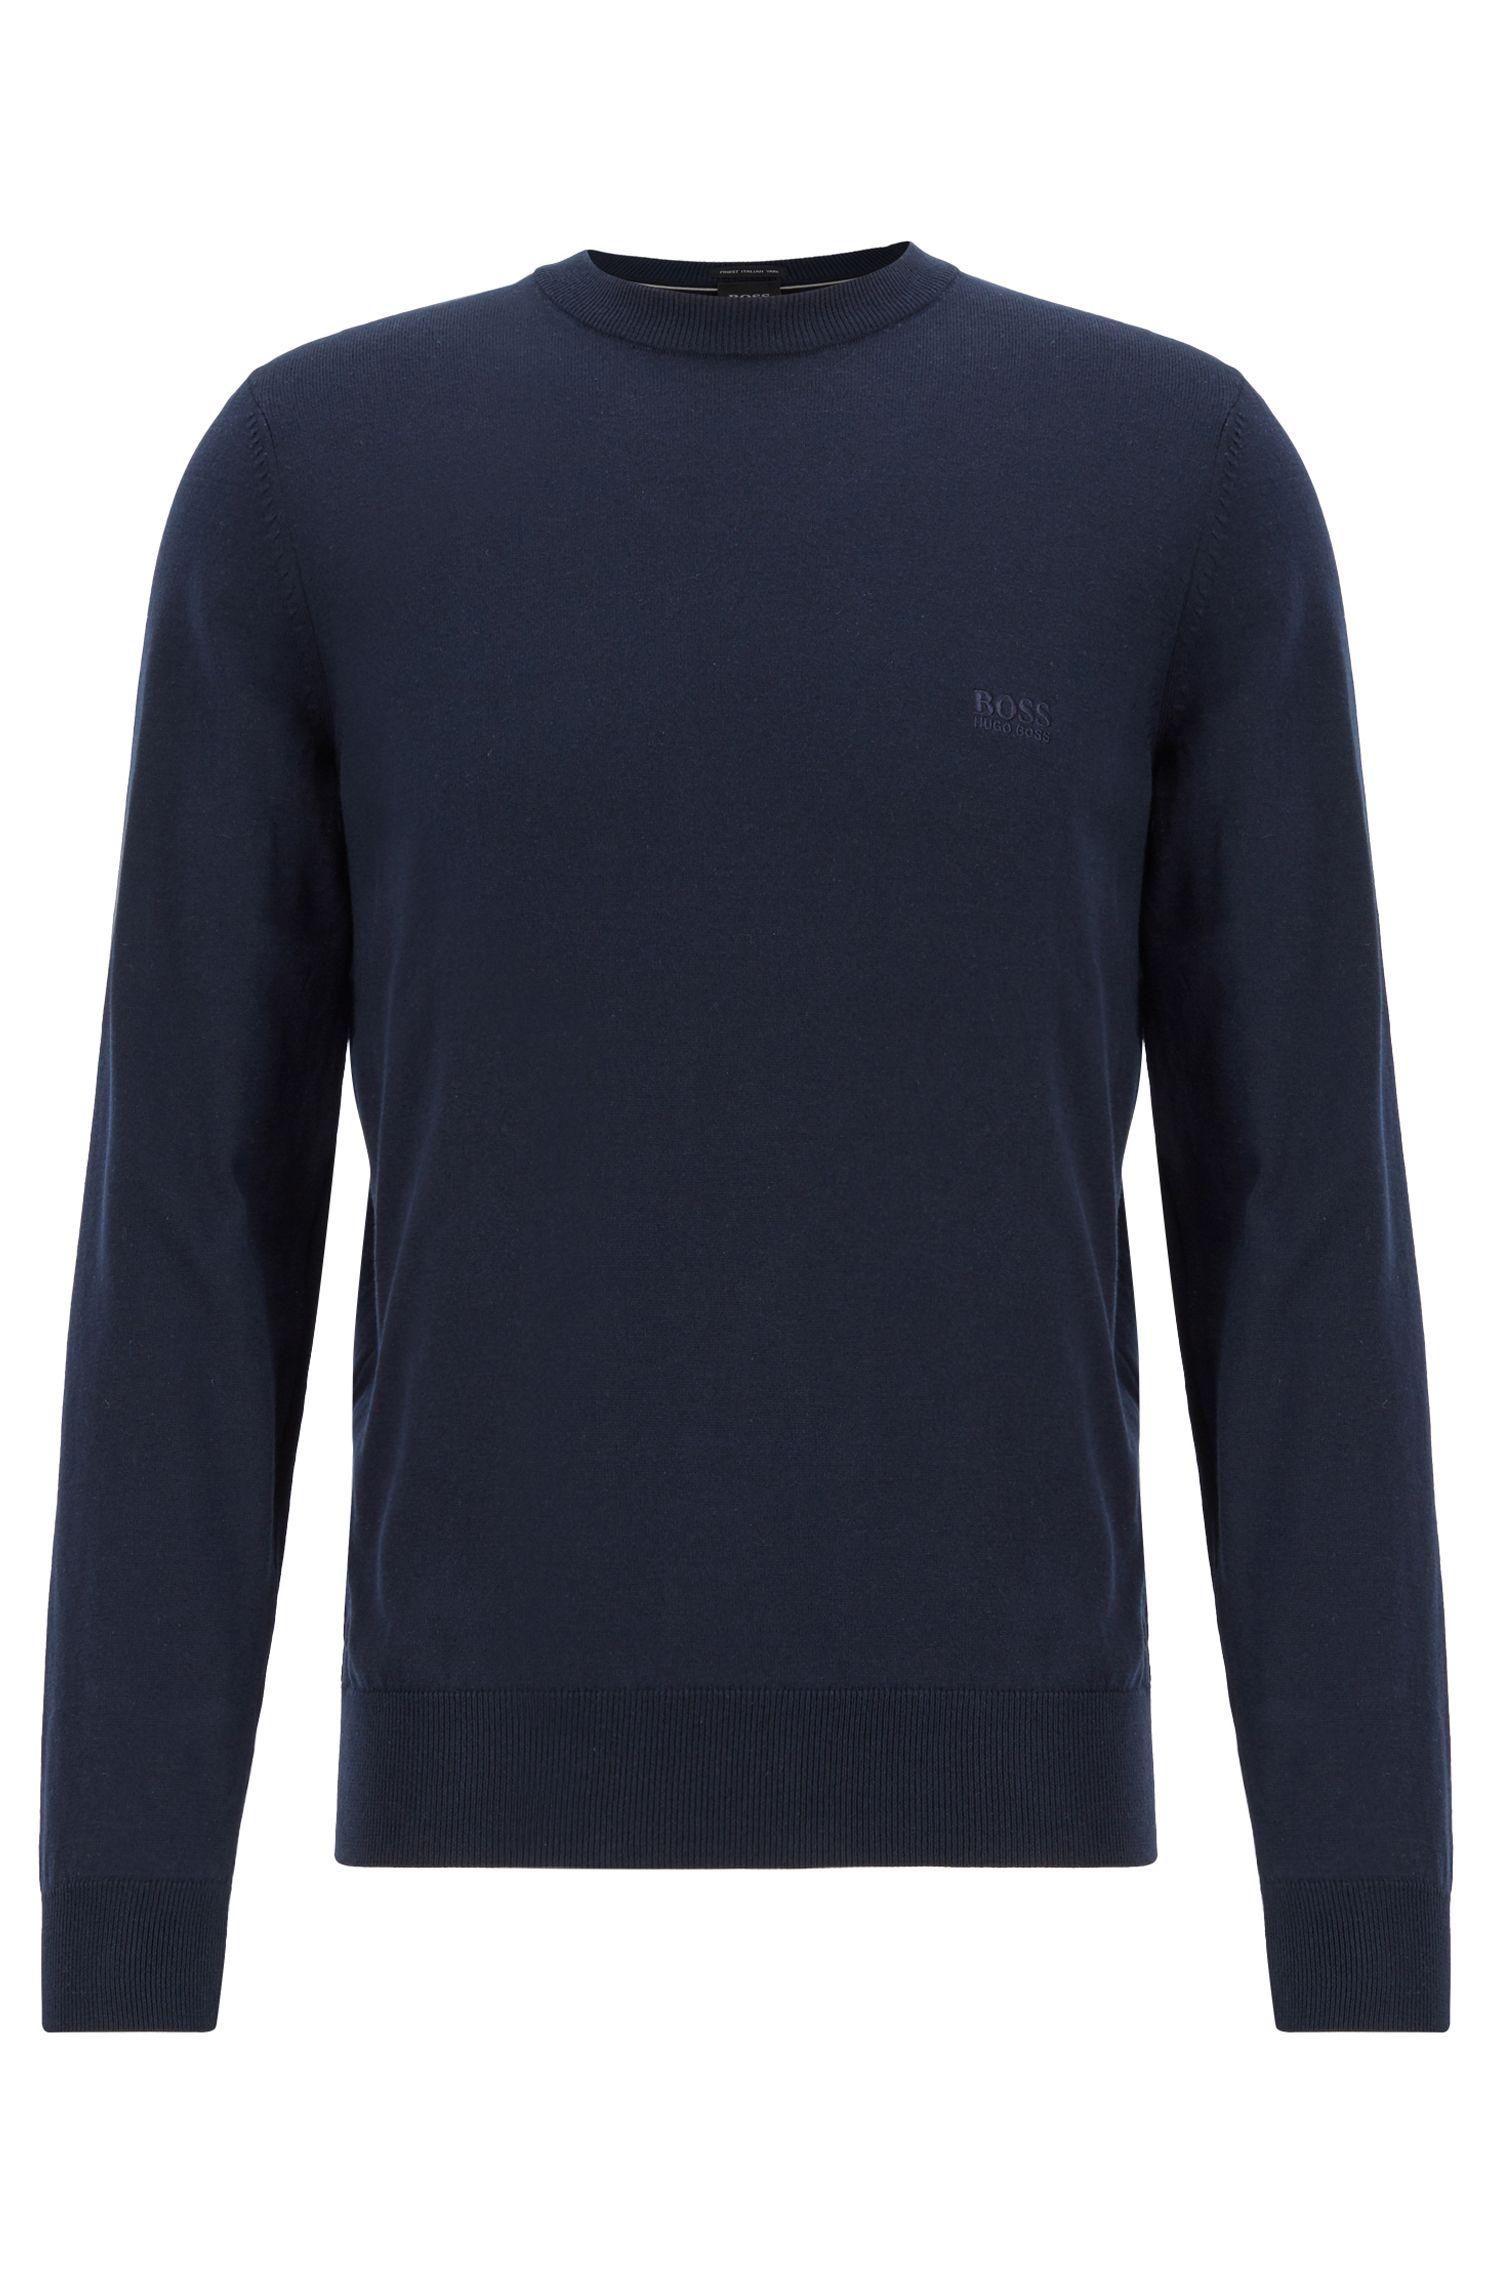 Crew-neck sweater in single-jersey cotton, Dark Blue